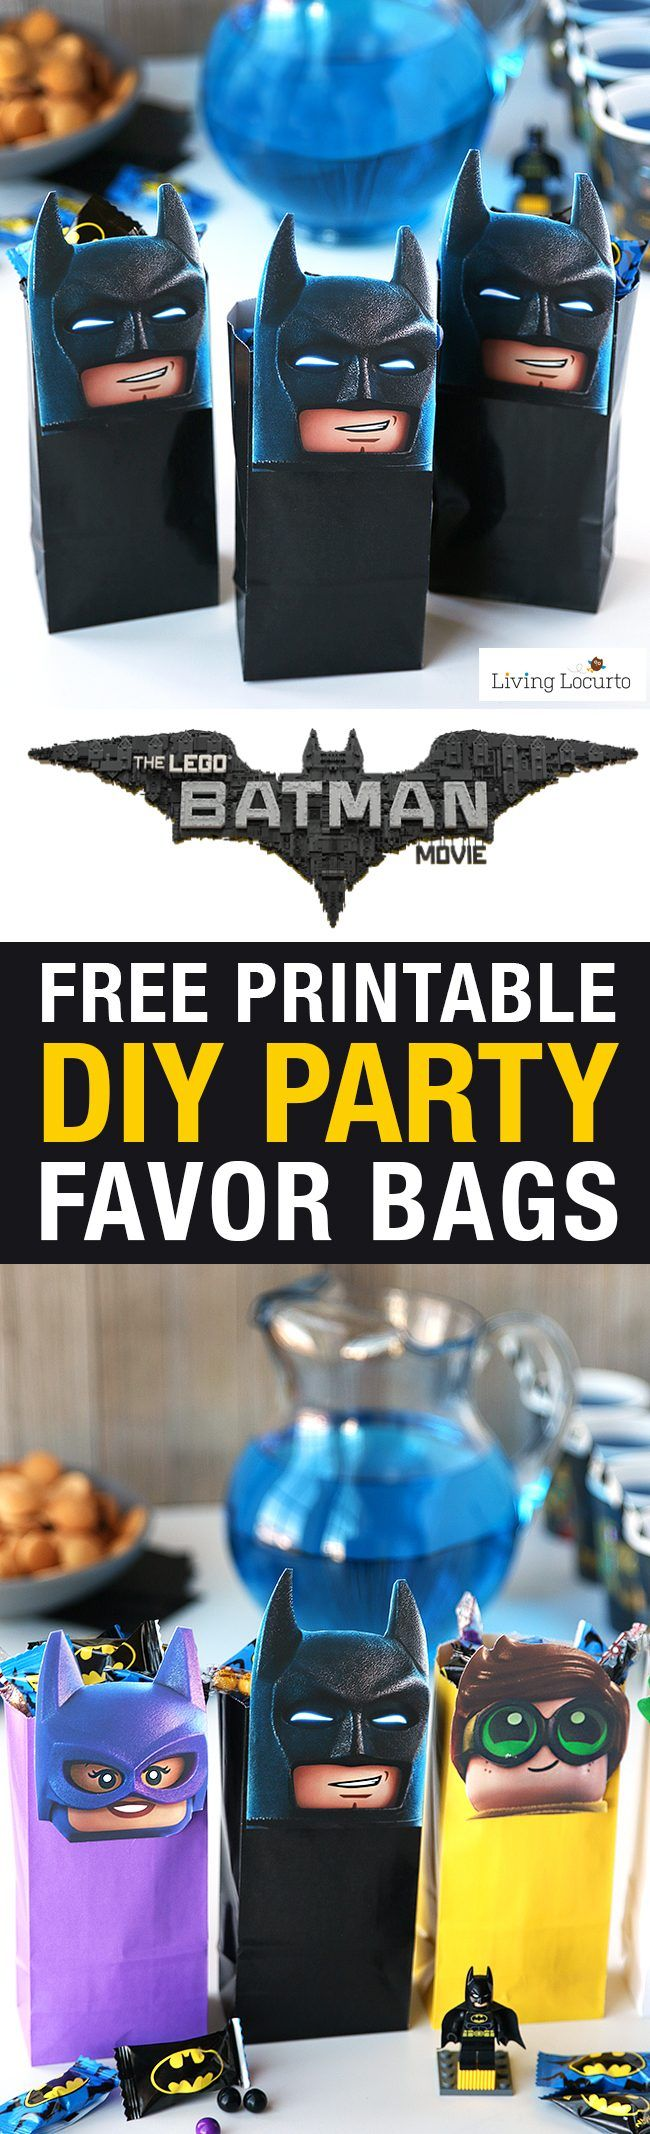 free printable funny0th birthday invitations%0A The LEGO Batman Movie Party Treat Bags  Free Printable LEGO Minifigures for  DIY Birthday Party